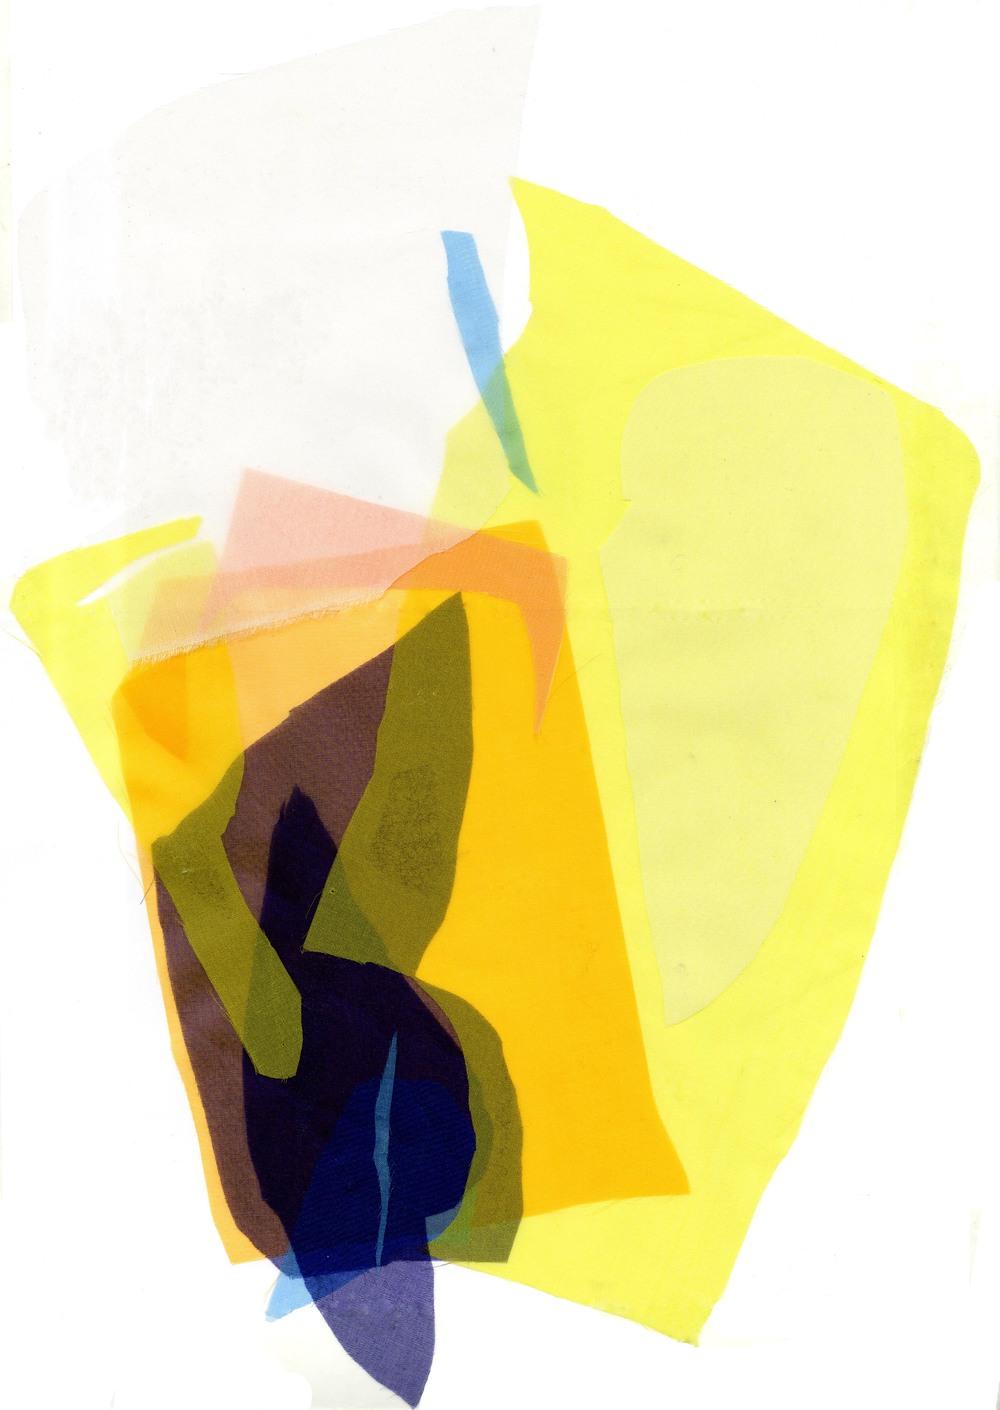 Copy of amber071.jpg